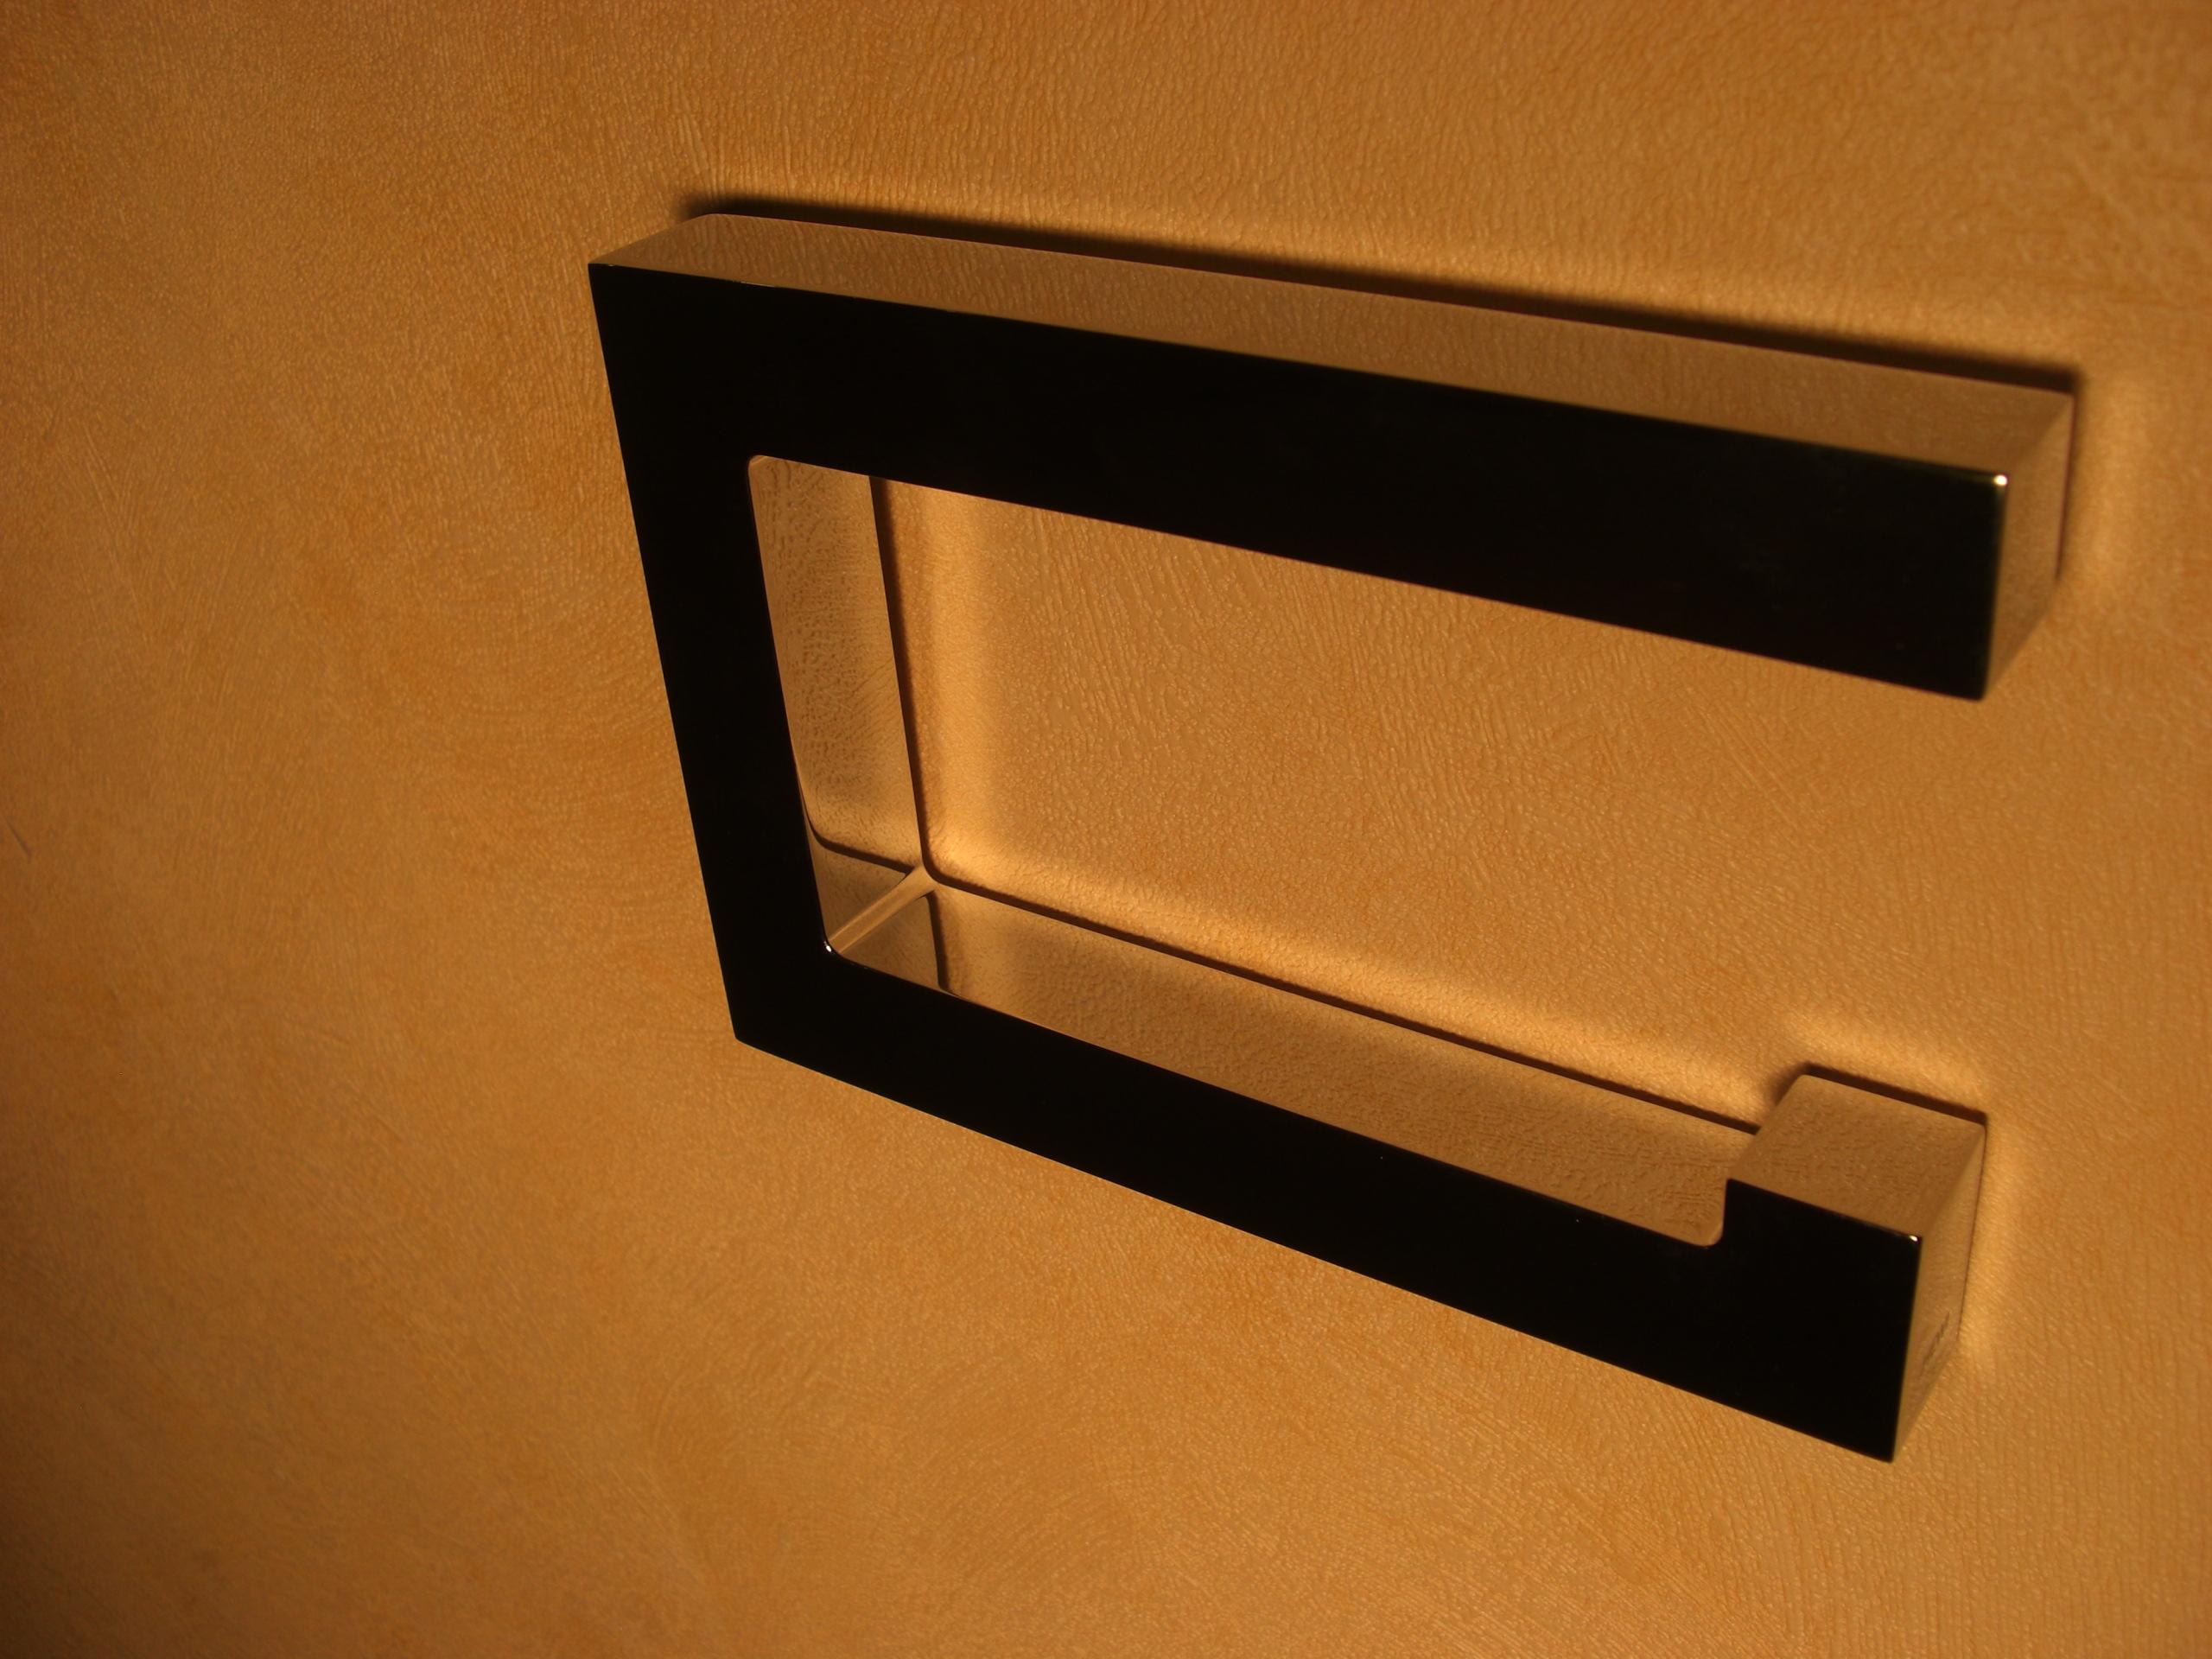 toilettenpapierhalter hewi system 100 chrom. Black Bedroom Furniture Sets. Home Design Ideas